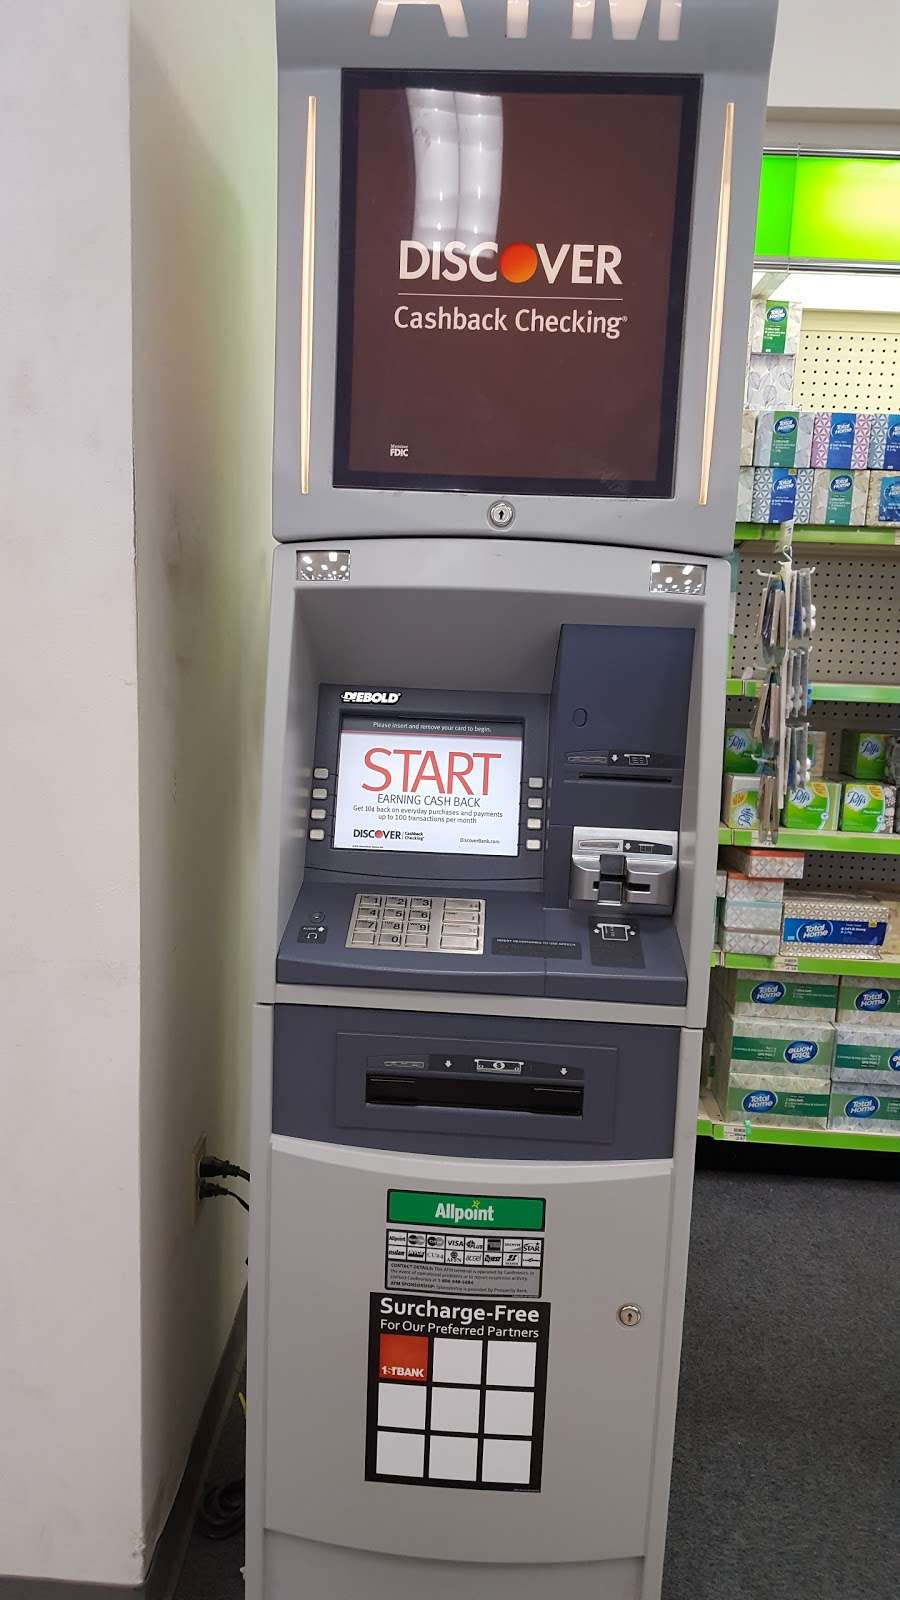 Discover ATM / 14st Bank of Colorado, 146145 E Baseline Rd, Phoenix